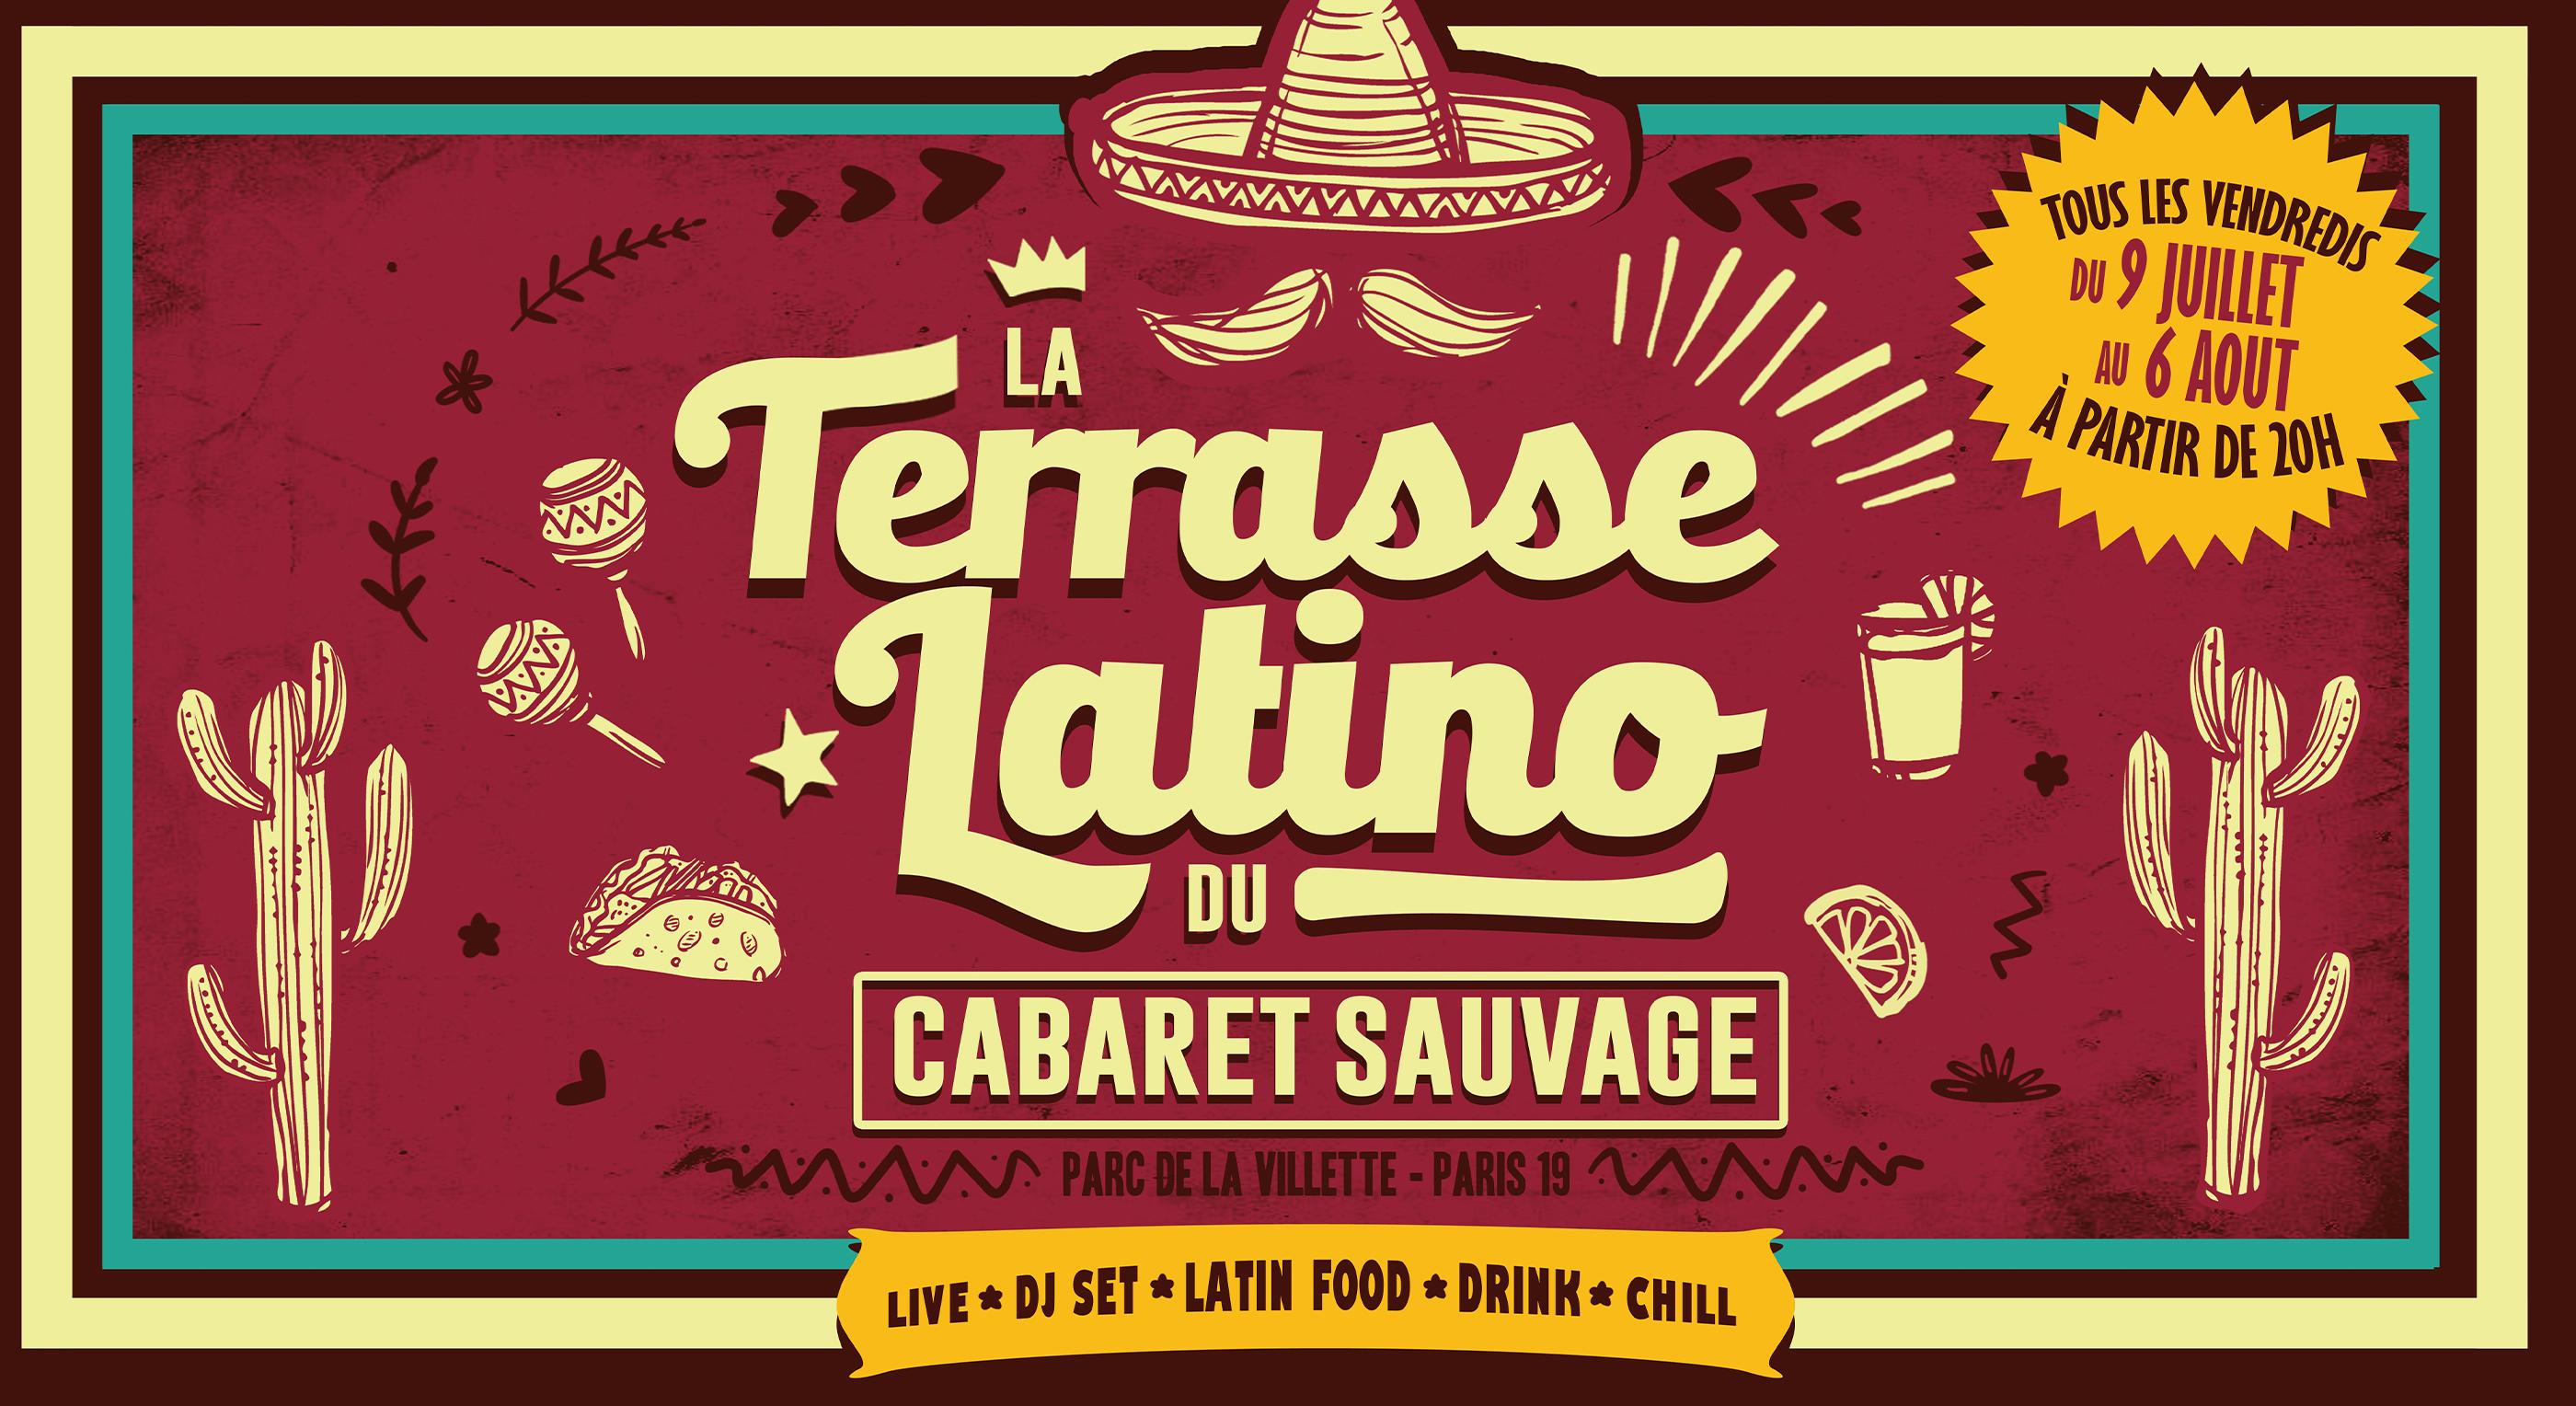 La Terrasse Latino - Vendredi 9 Juillet 2021